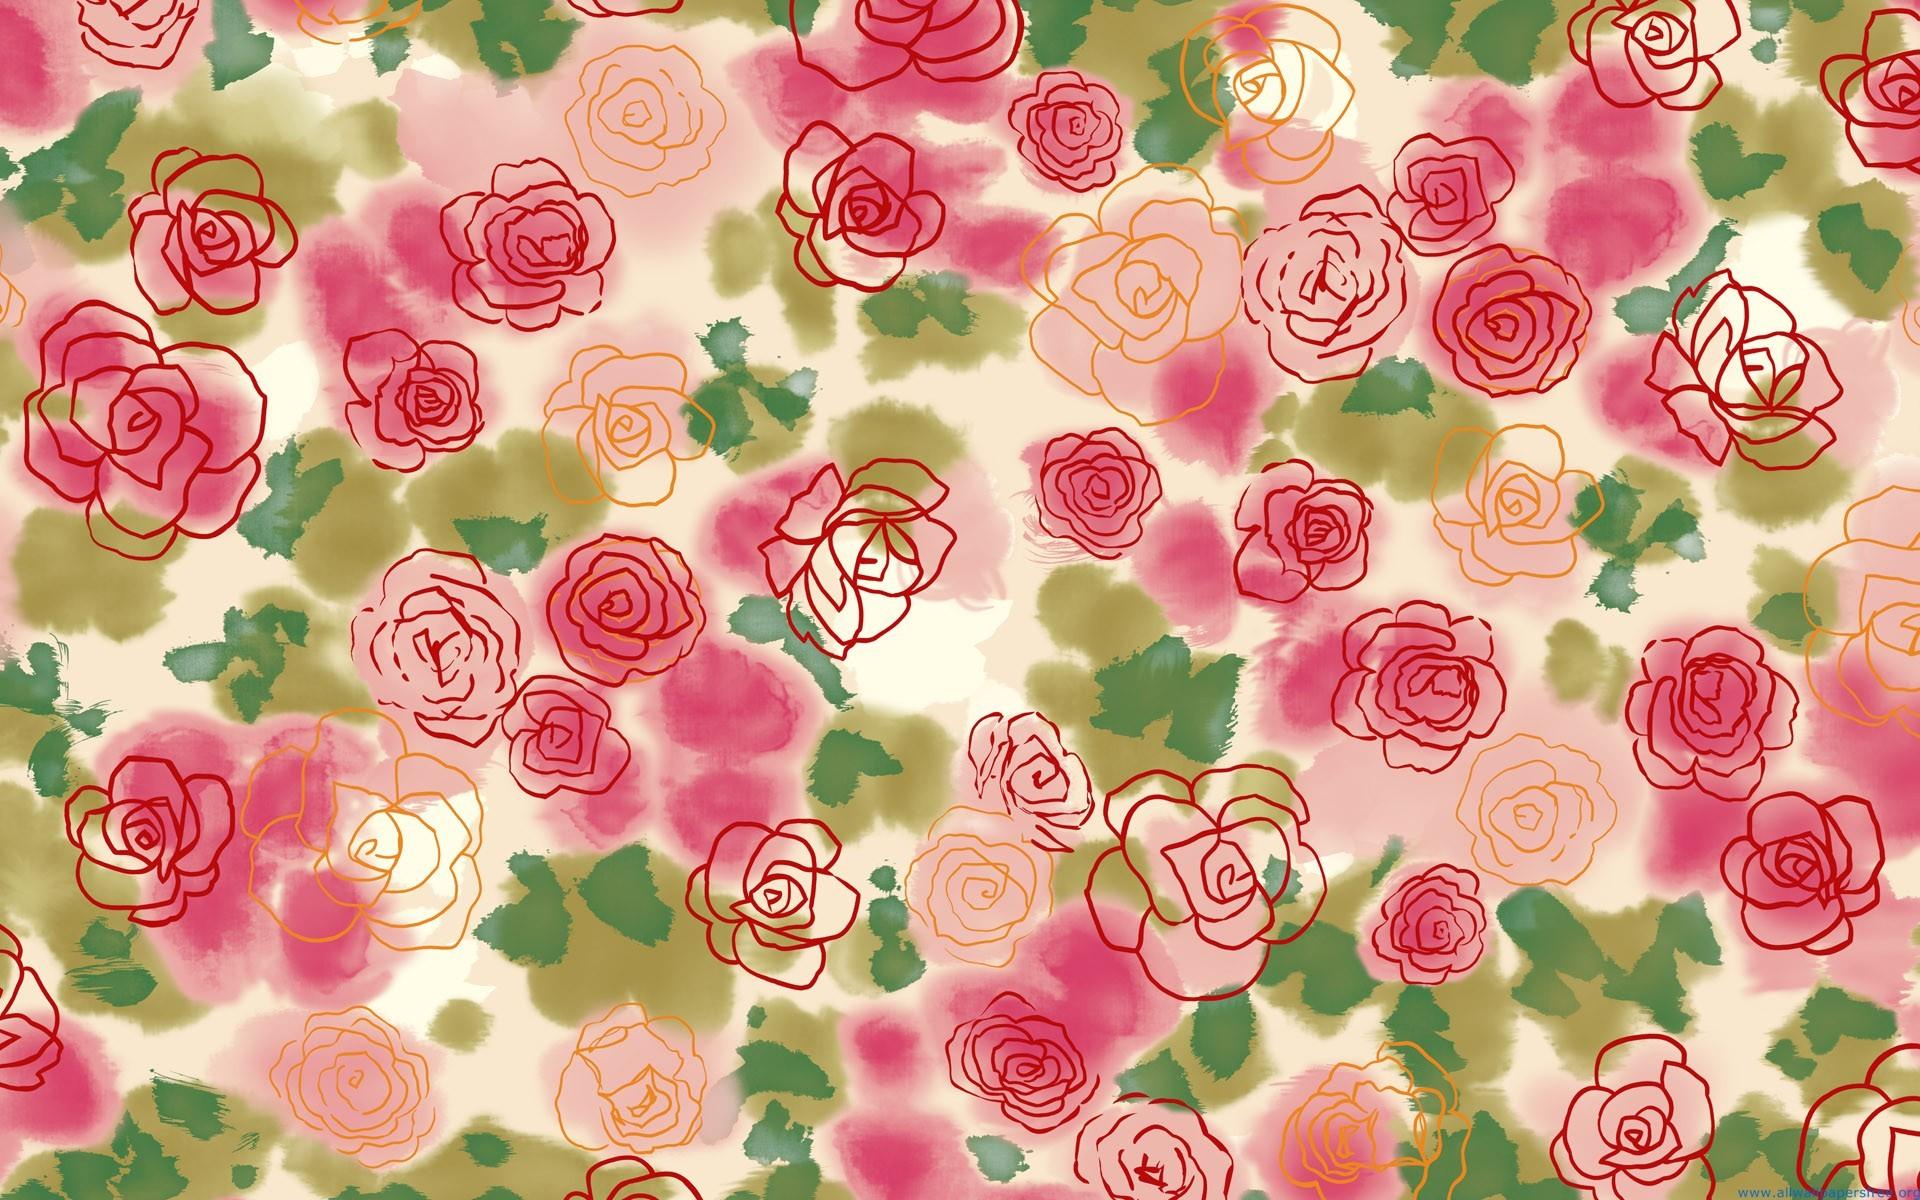 Kate Spade Wallpaper Desktop (53+ images)